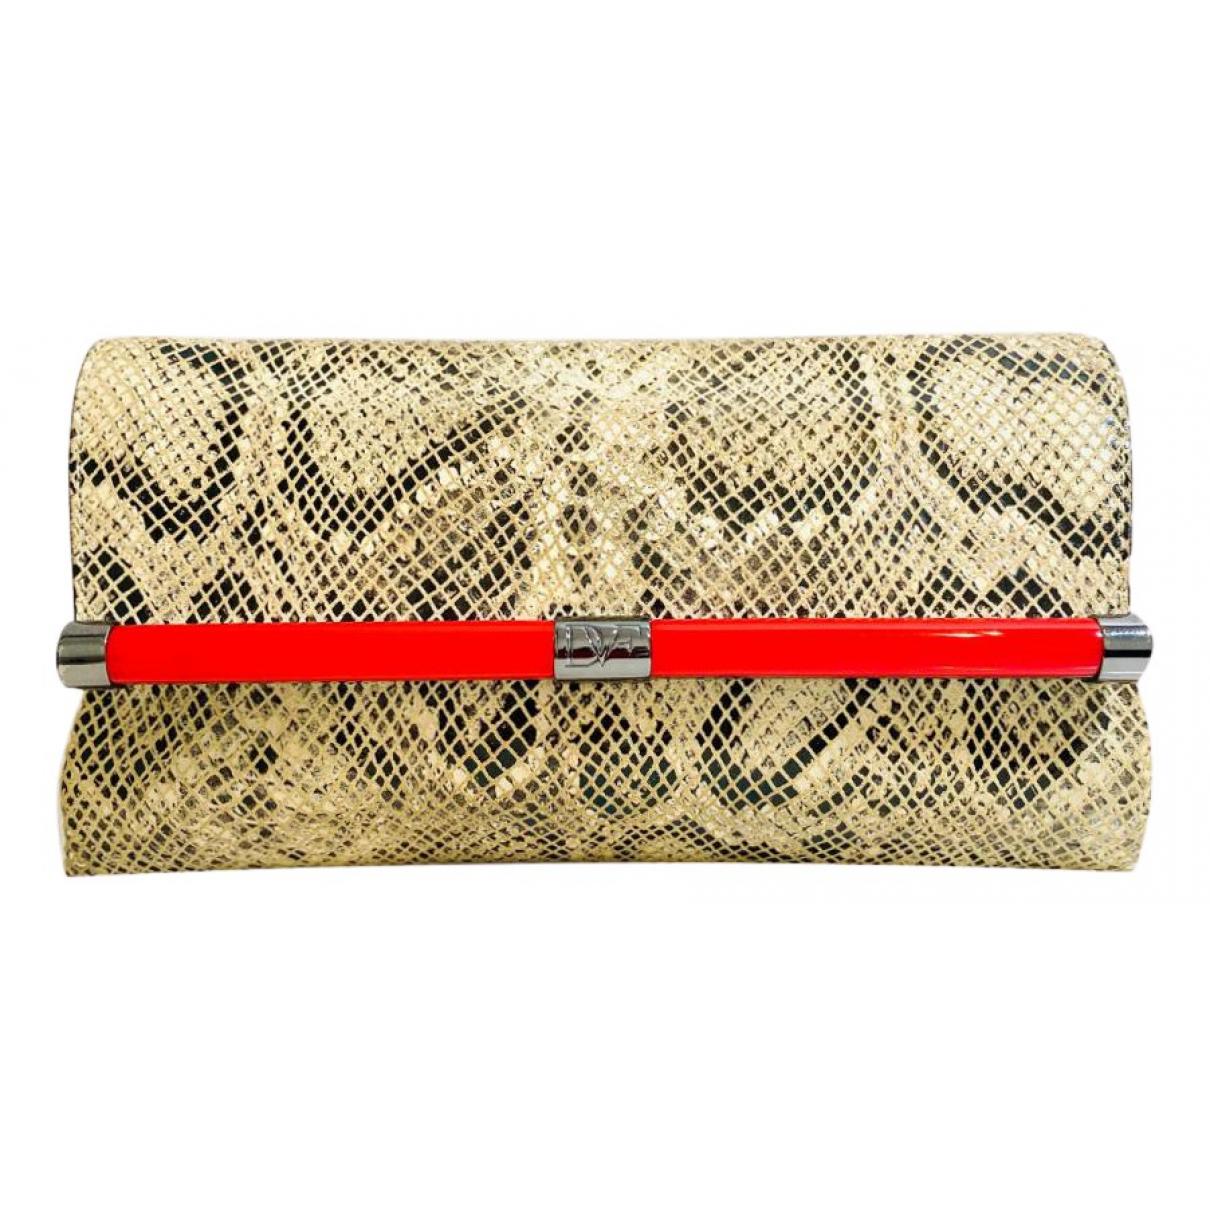 Diane Von Furstenberg N Multicolour Leather Clutch bag for Women N